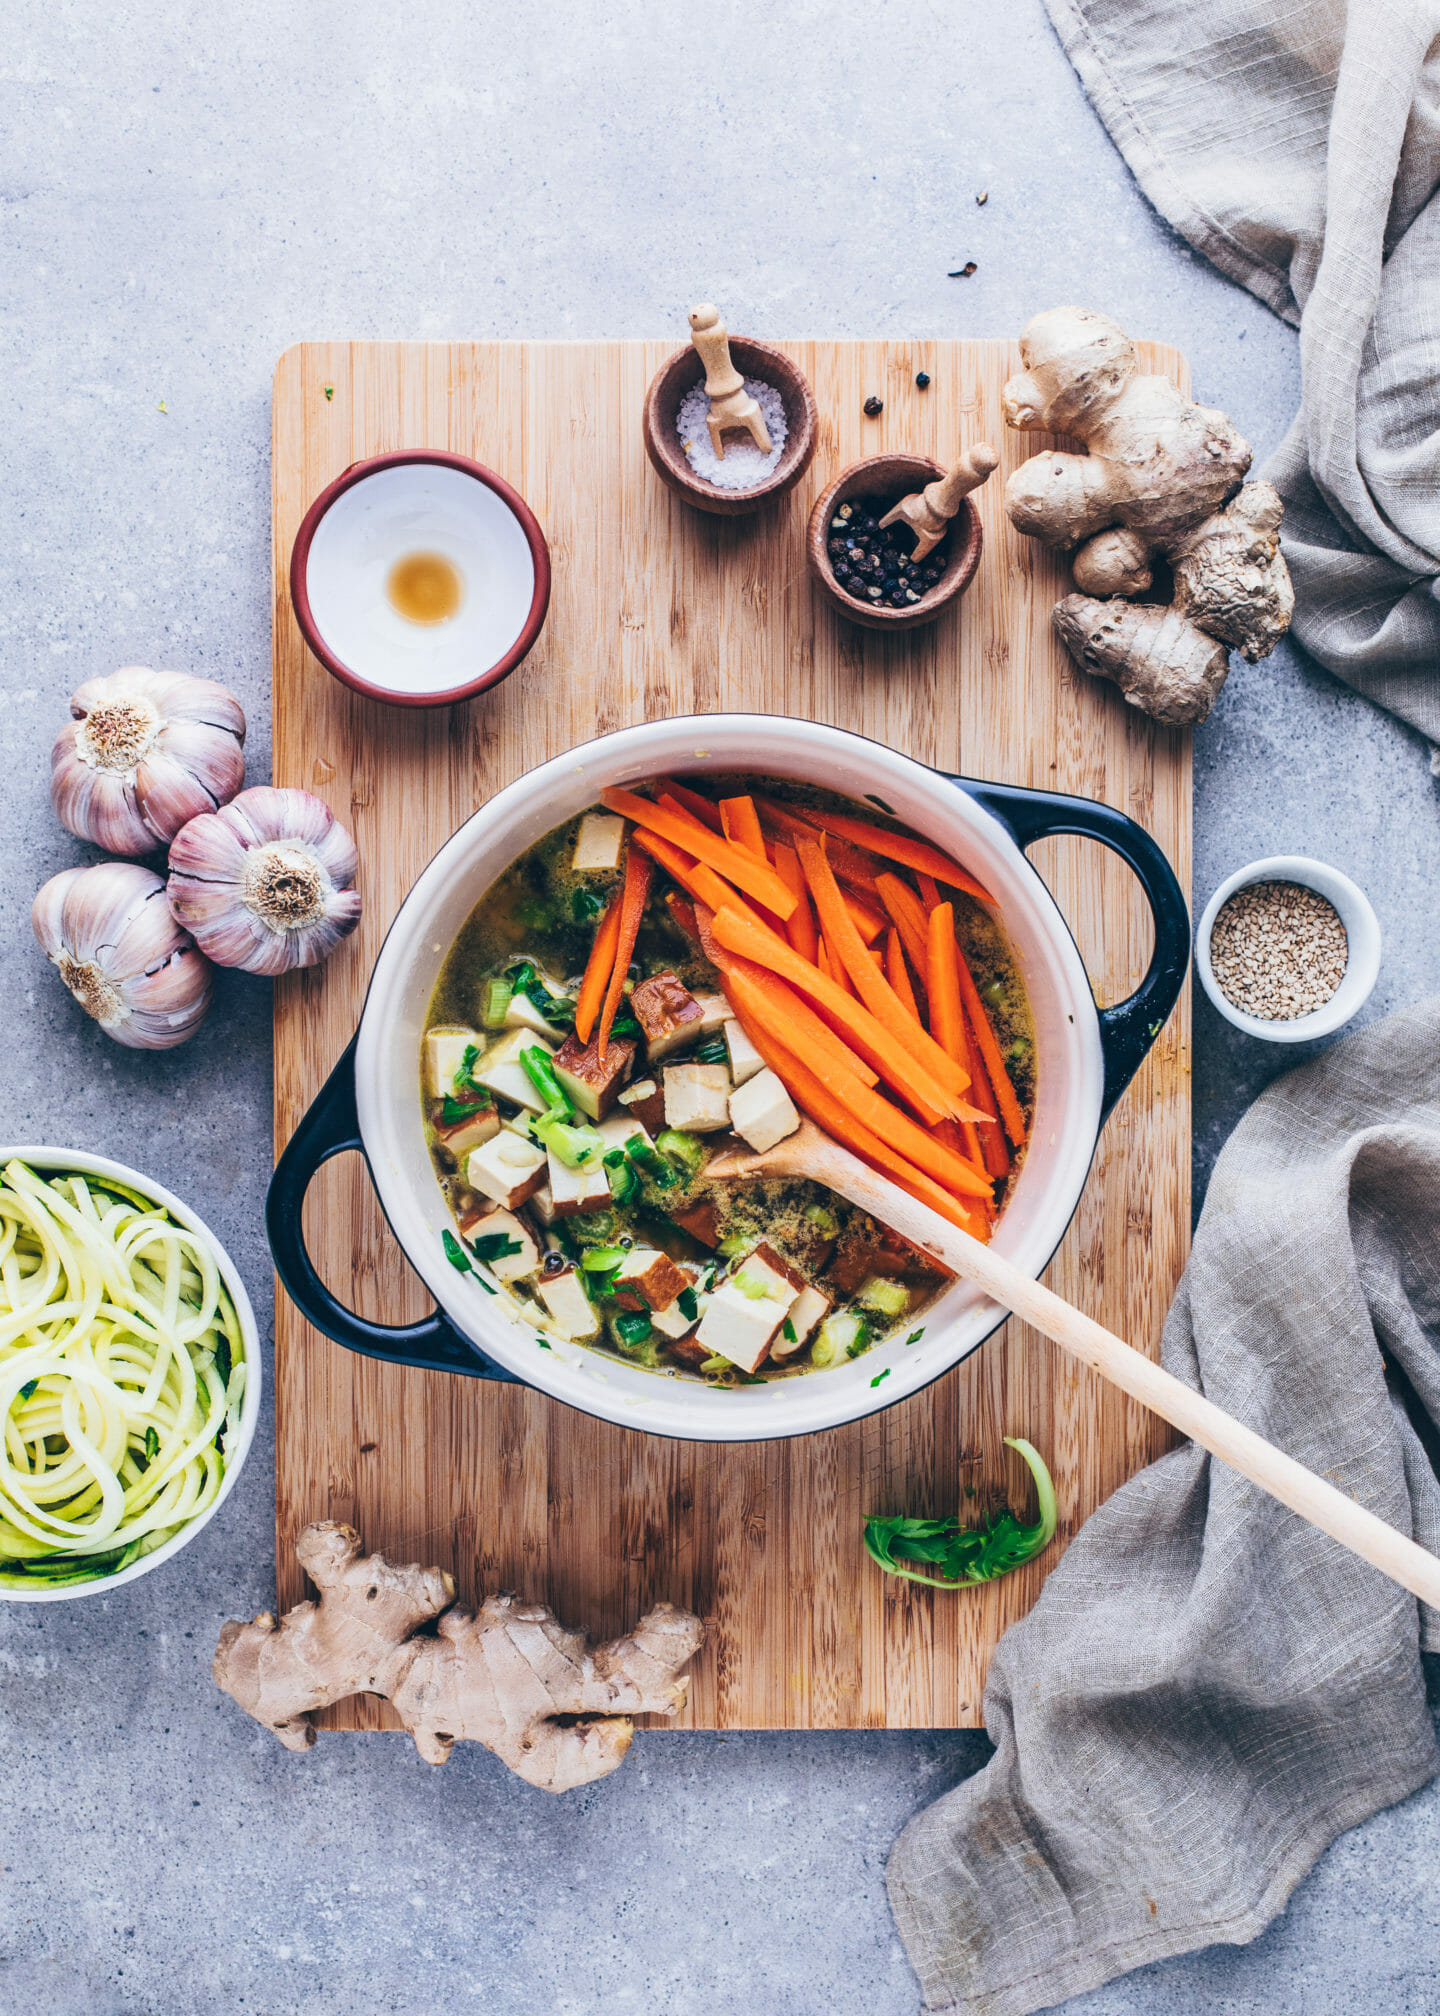 How to make dumpling potsticker wonton soup